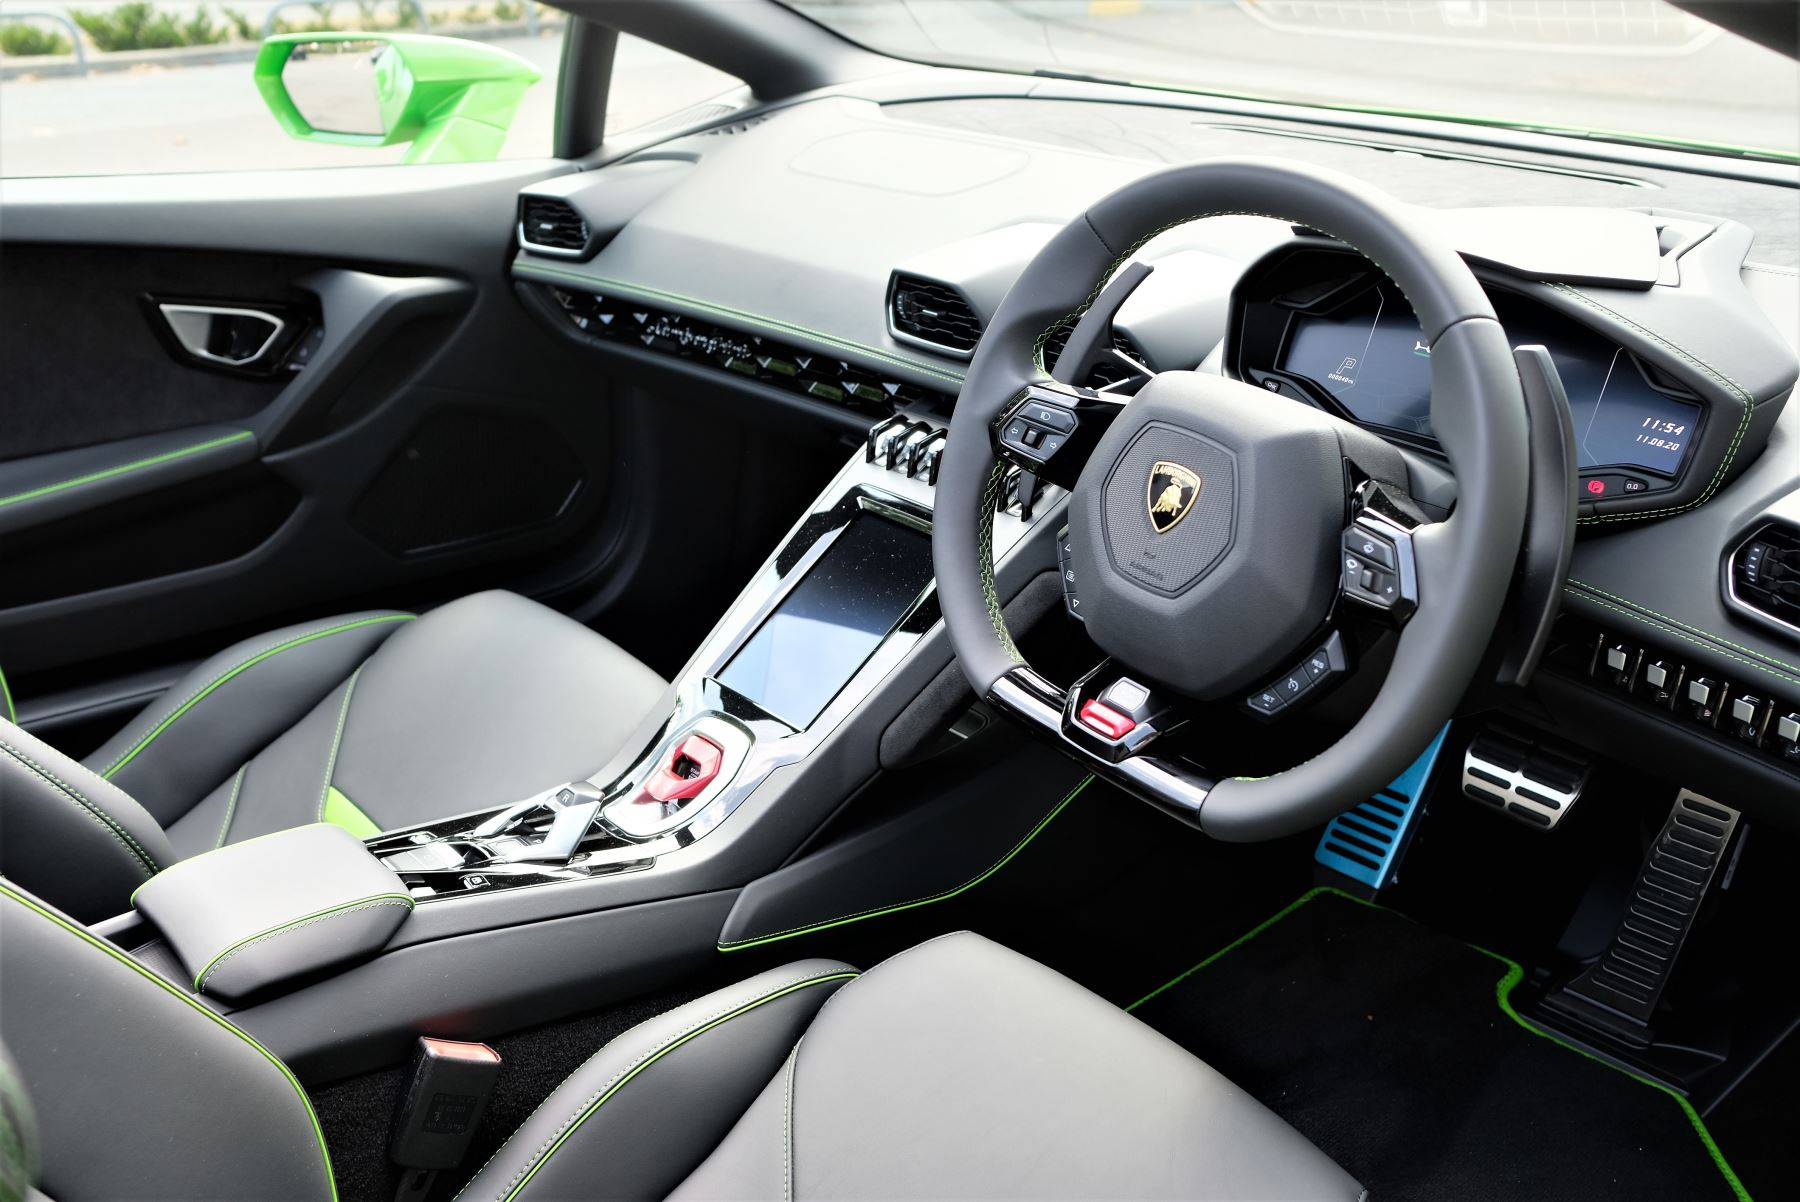 Lamborghini Huracan EVO Spyder 5.2 V10 640 2dr Auto AWD image 10